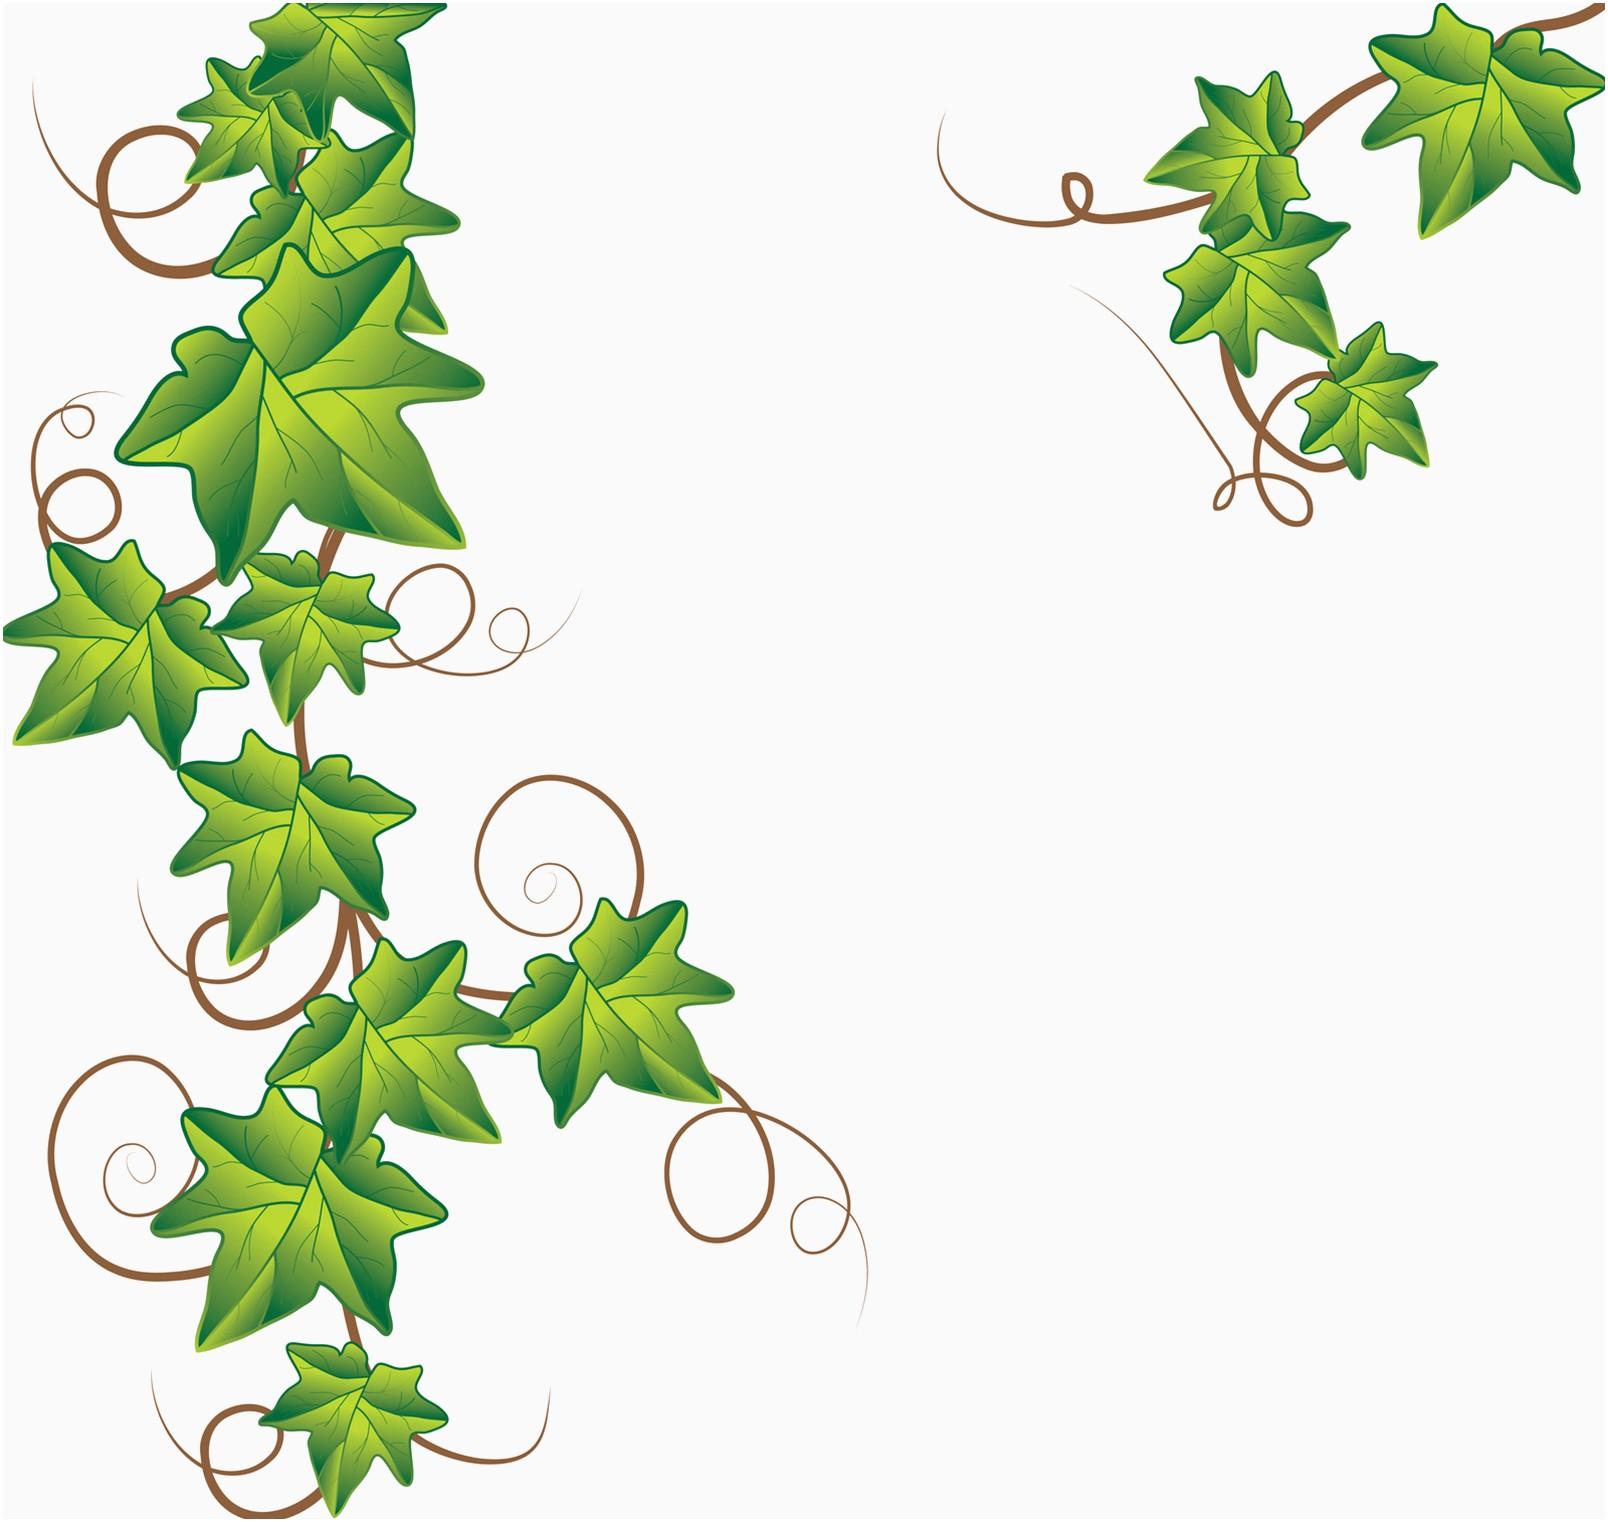 1608x1522 Free Vine Clipart Fresh Free Ivy Vine Clipart 26